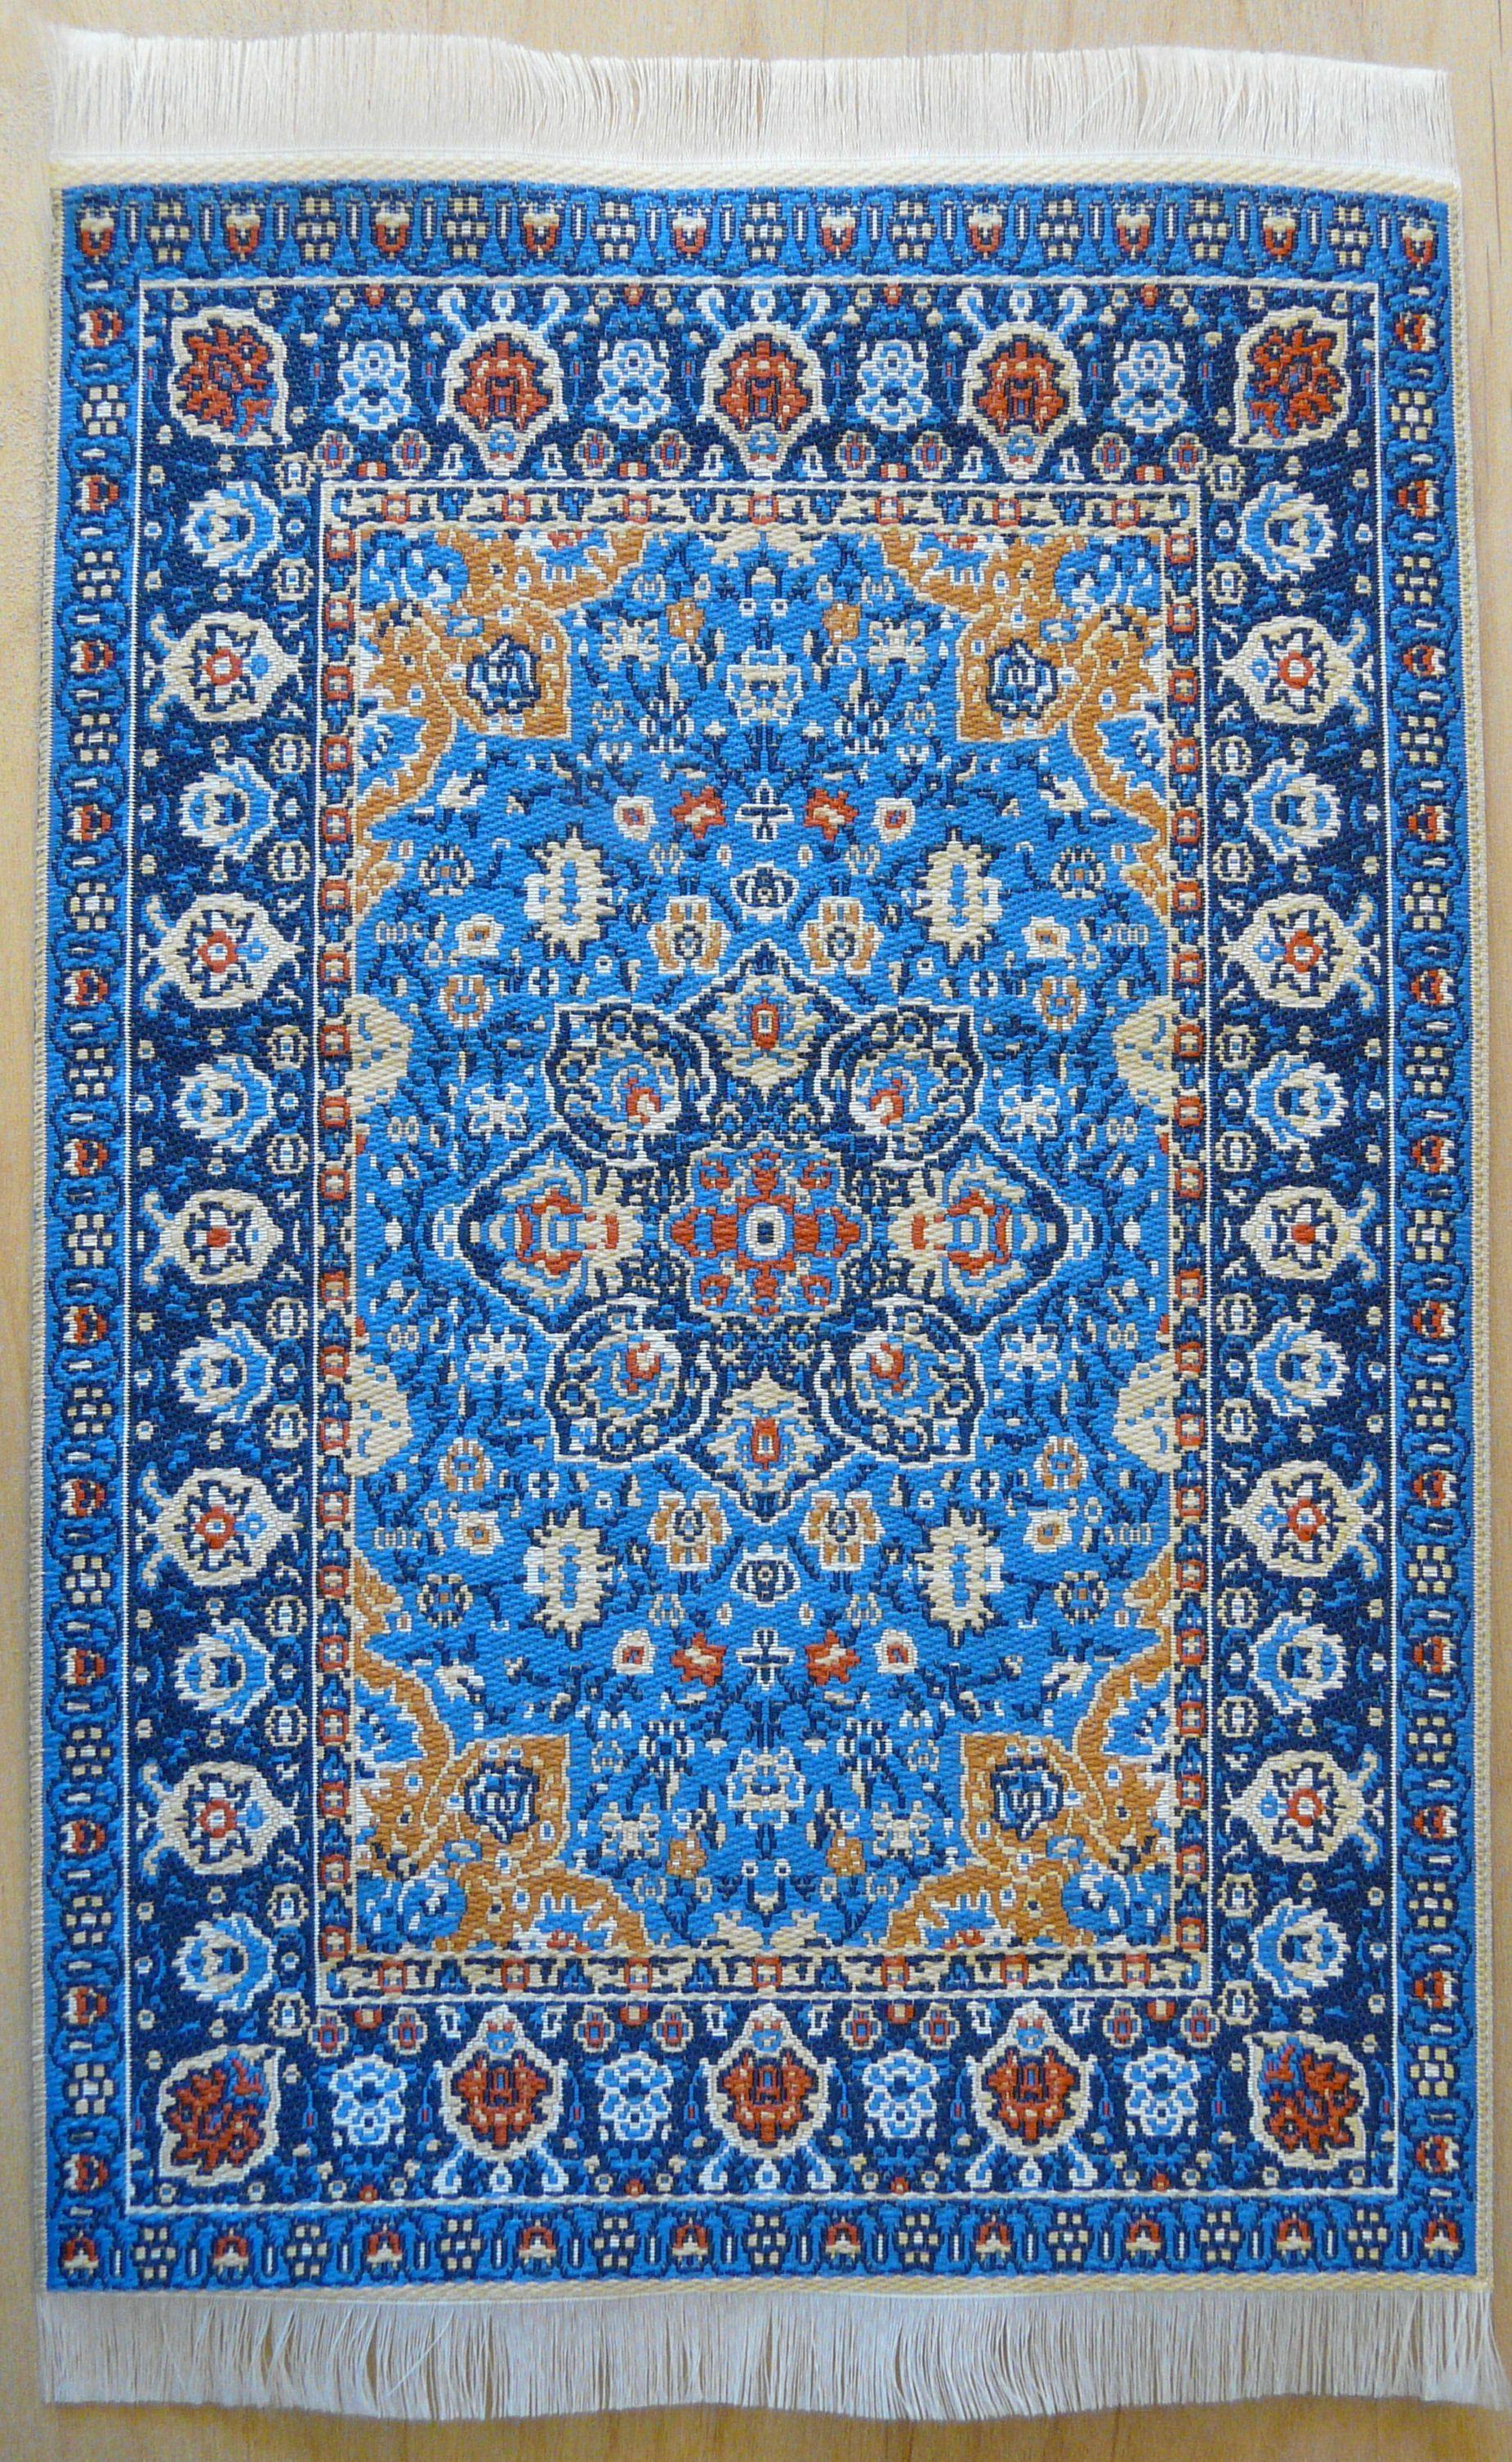 Turkish carpets blue turkish rug w/persian influence in design BBUHWBC